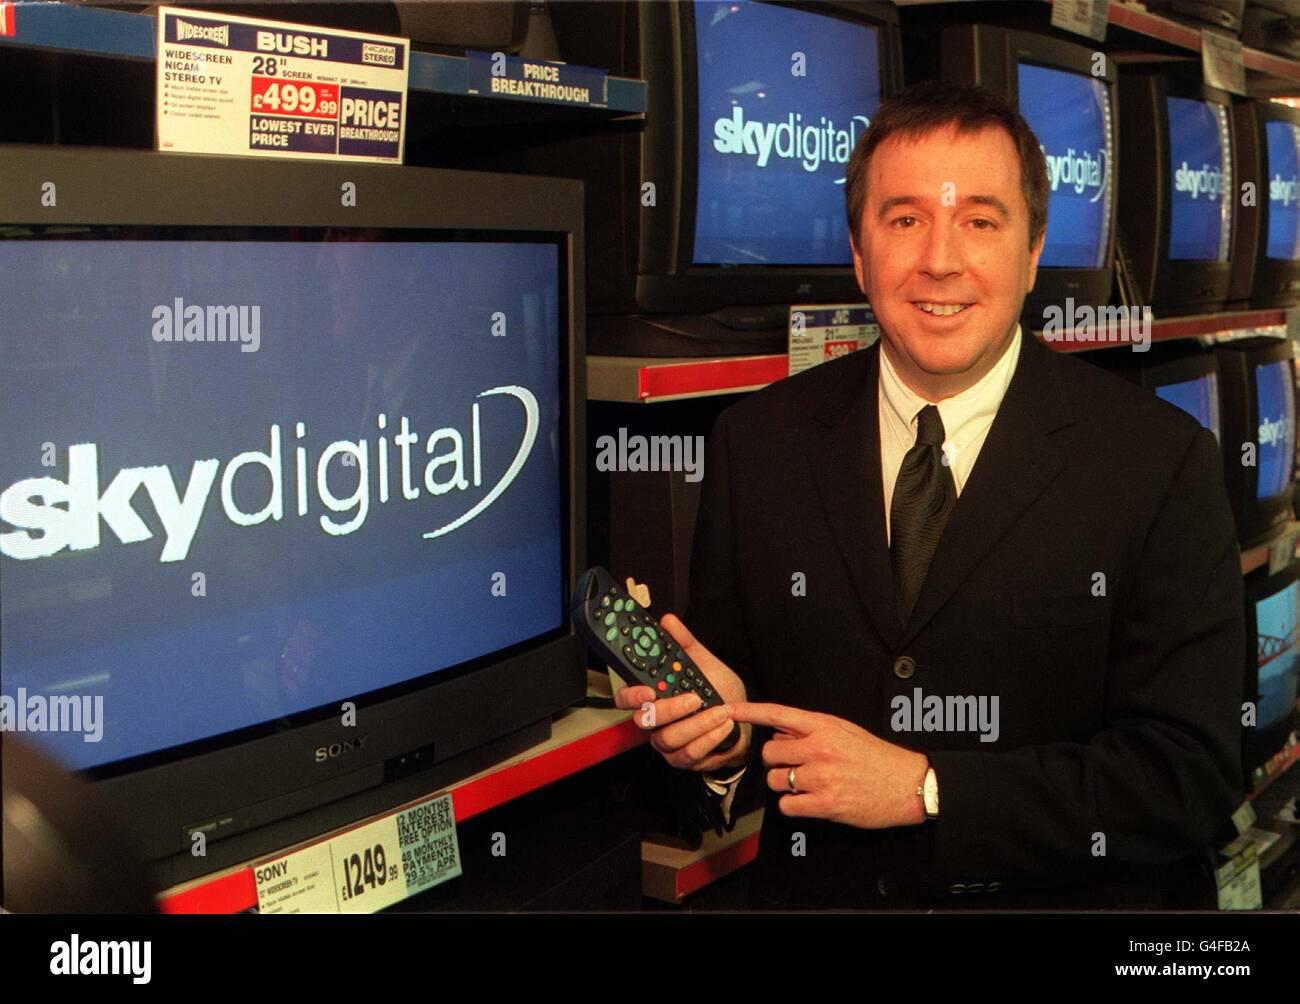 DIGITAL TV/Booth - Stock Image